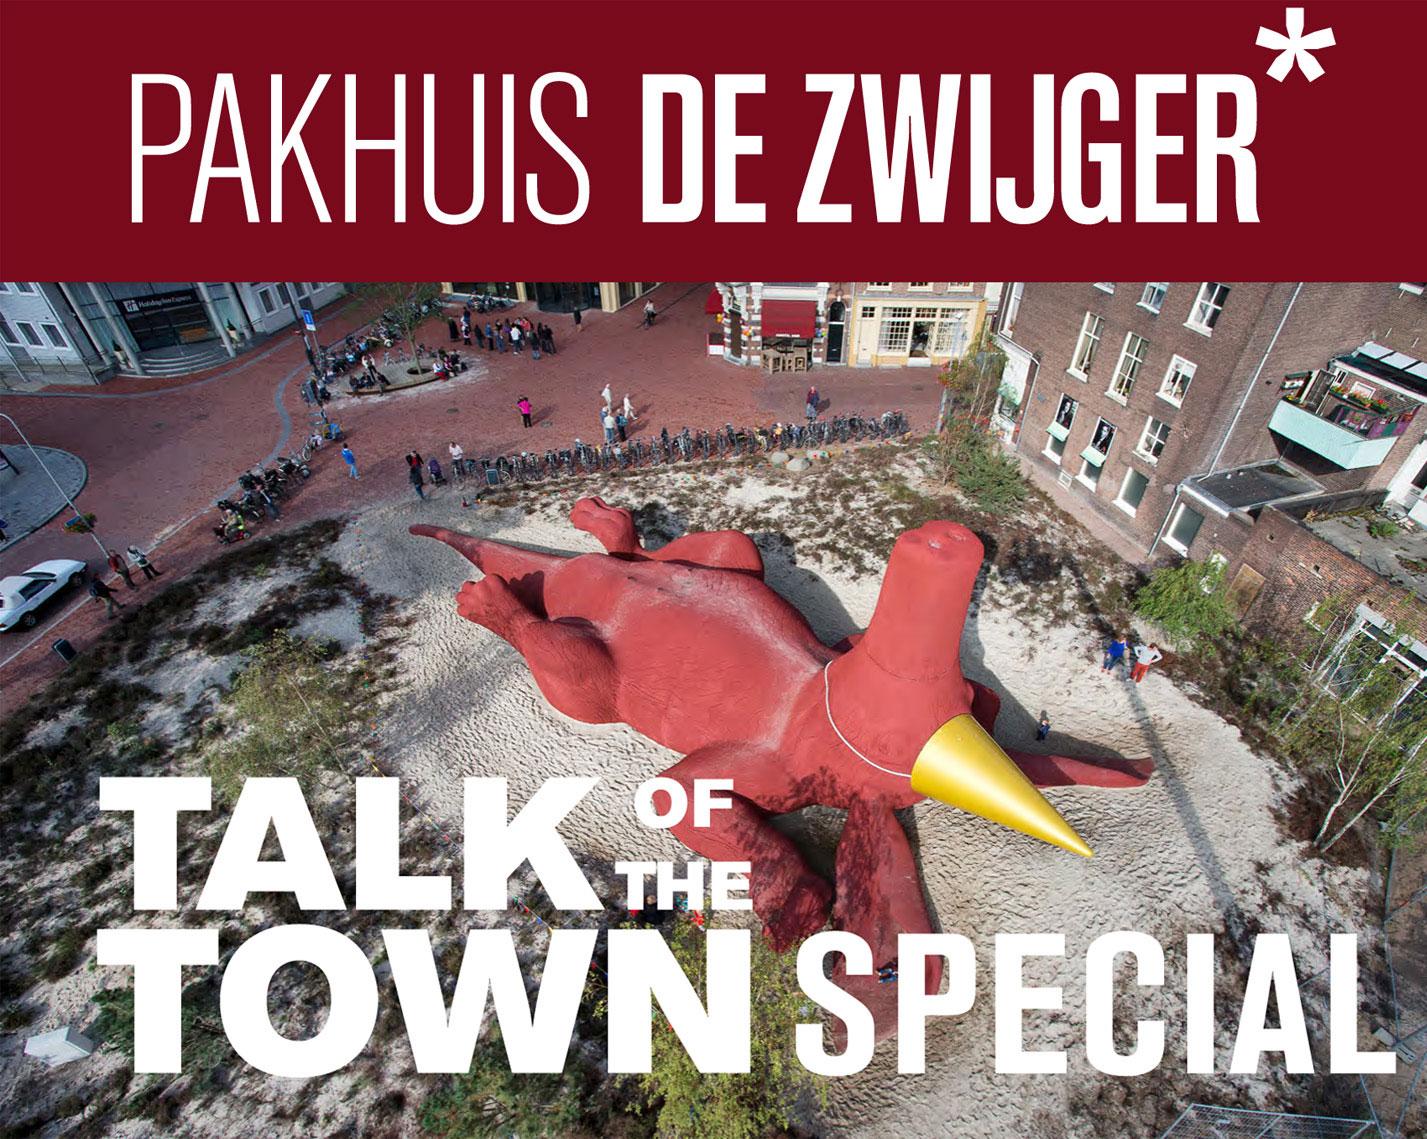 Meaningful marketing pakhuis de Zwijger